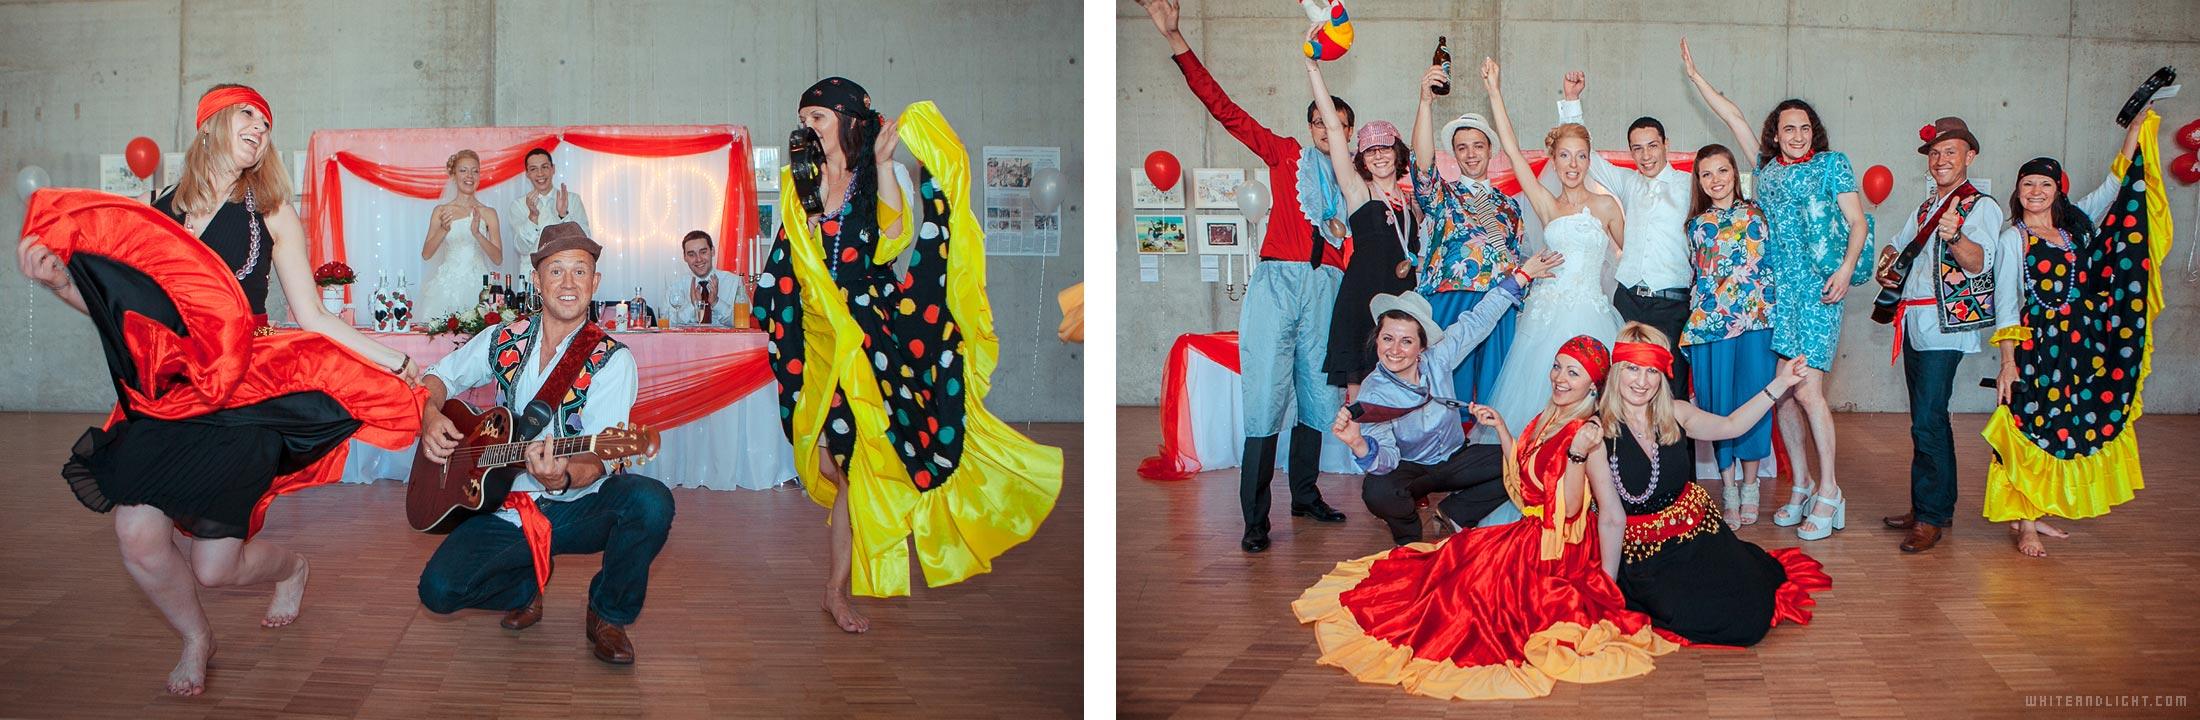 Wedding photographer Blog - weddingfirst dance songs